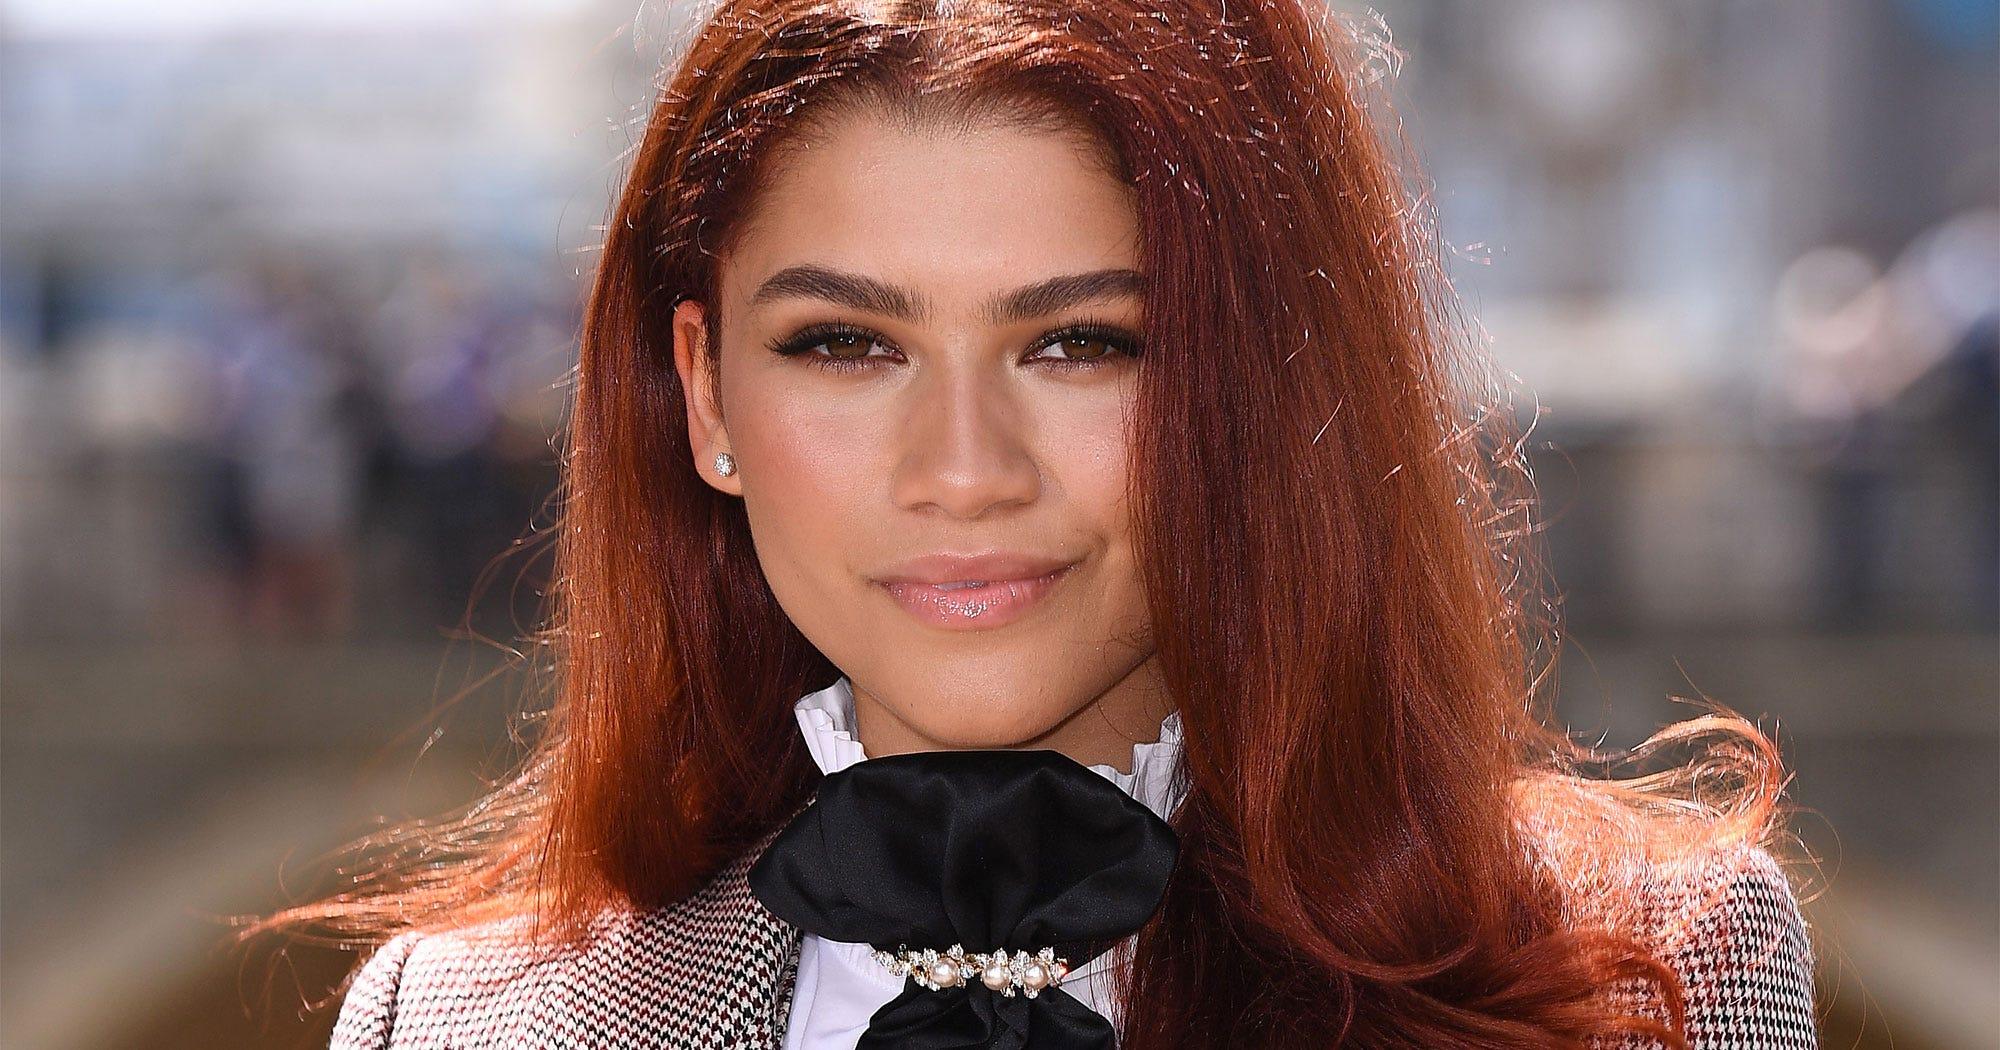 Red Hair Colour On Black Women Is Huge Celeb Trend 2019